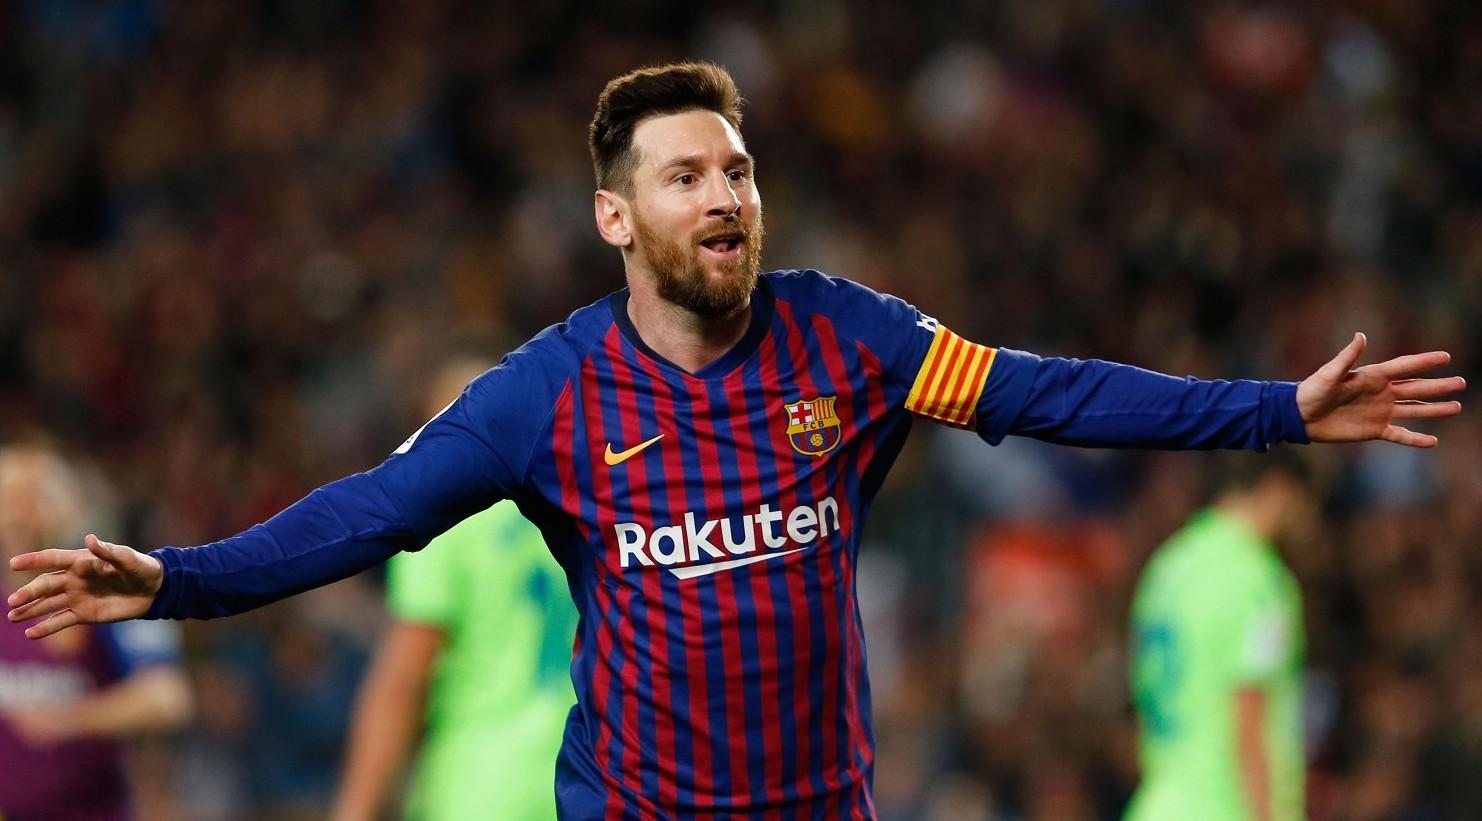 Barcellona Liverpool streaming gratis su